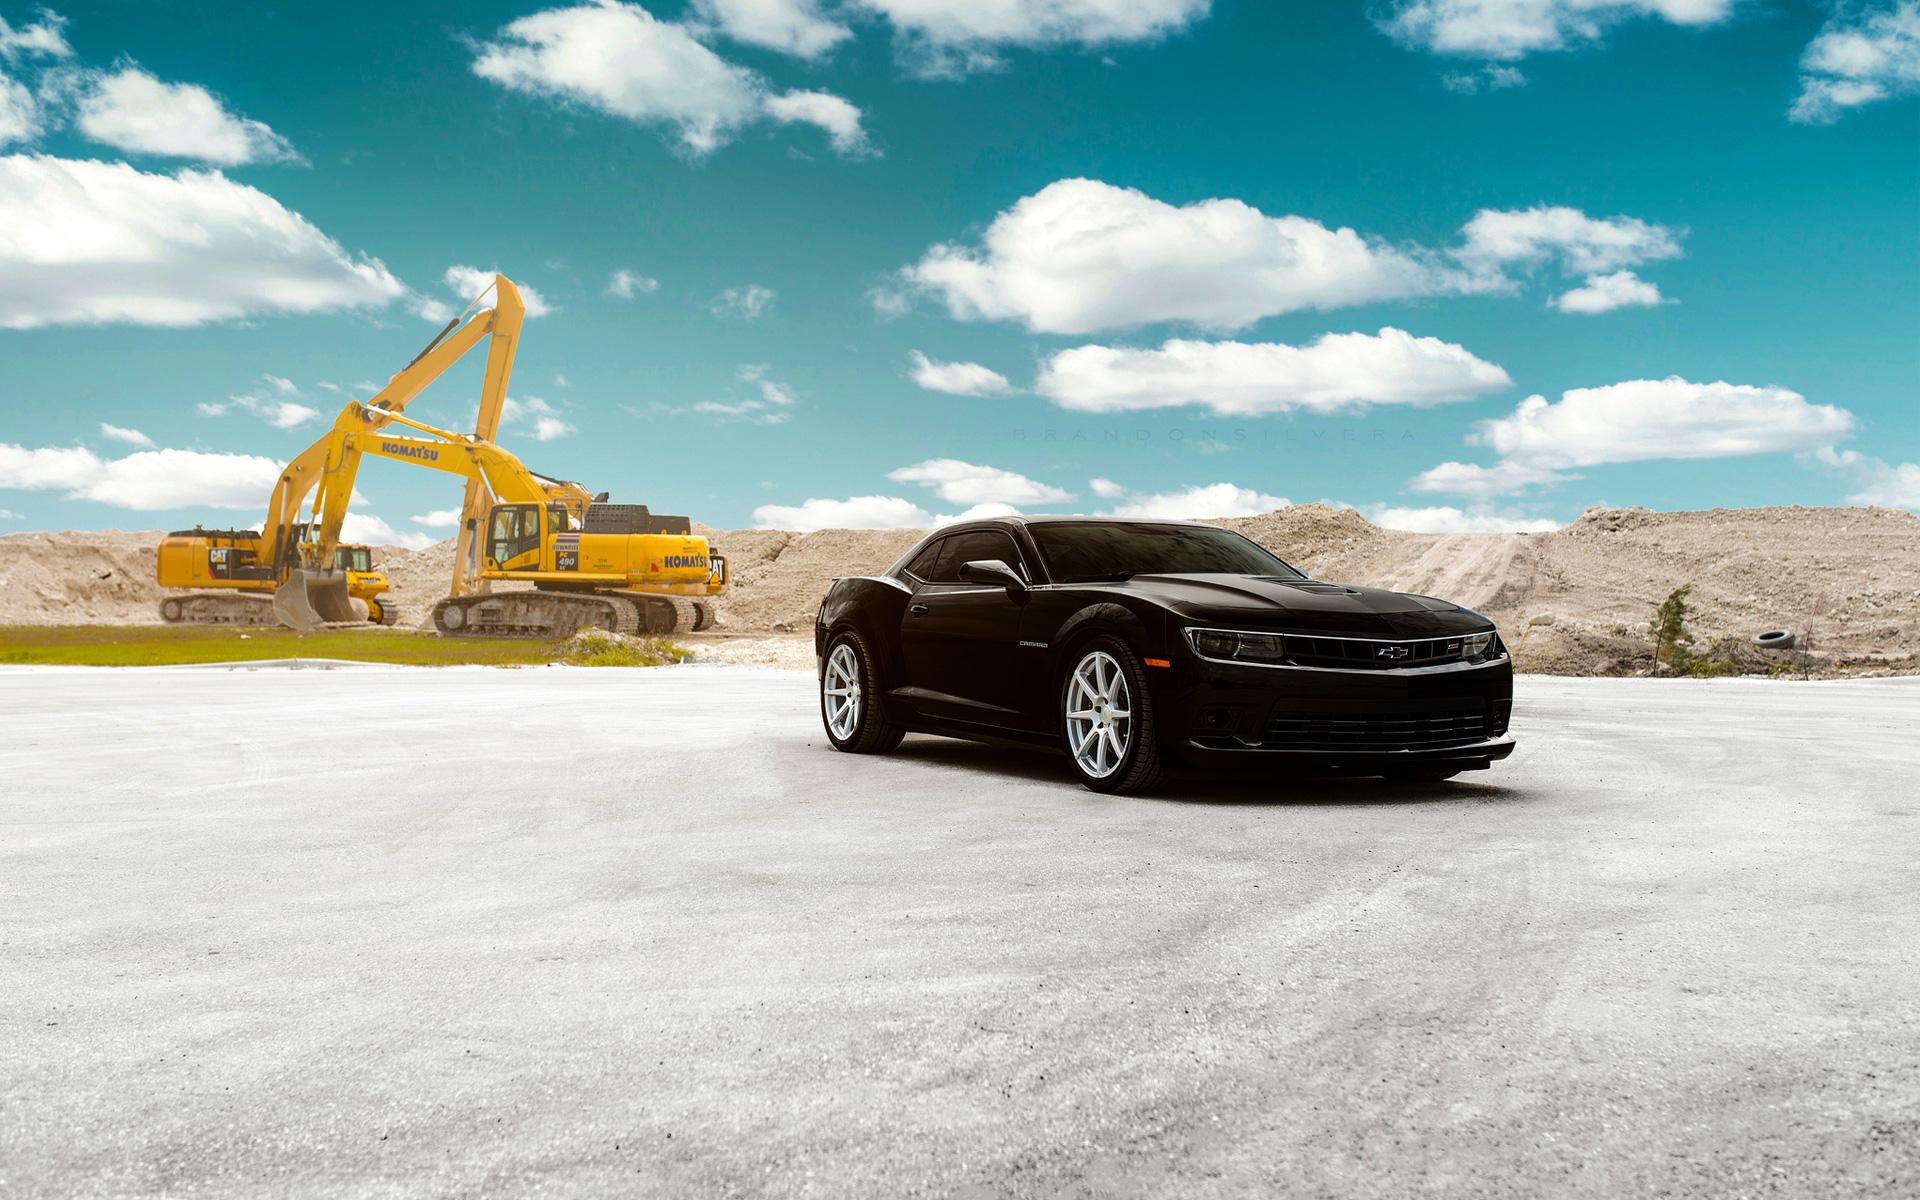 Chevrolet Camaro Ss Velgen Wheels Wallpaper Hd Car Wallpapers Id